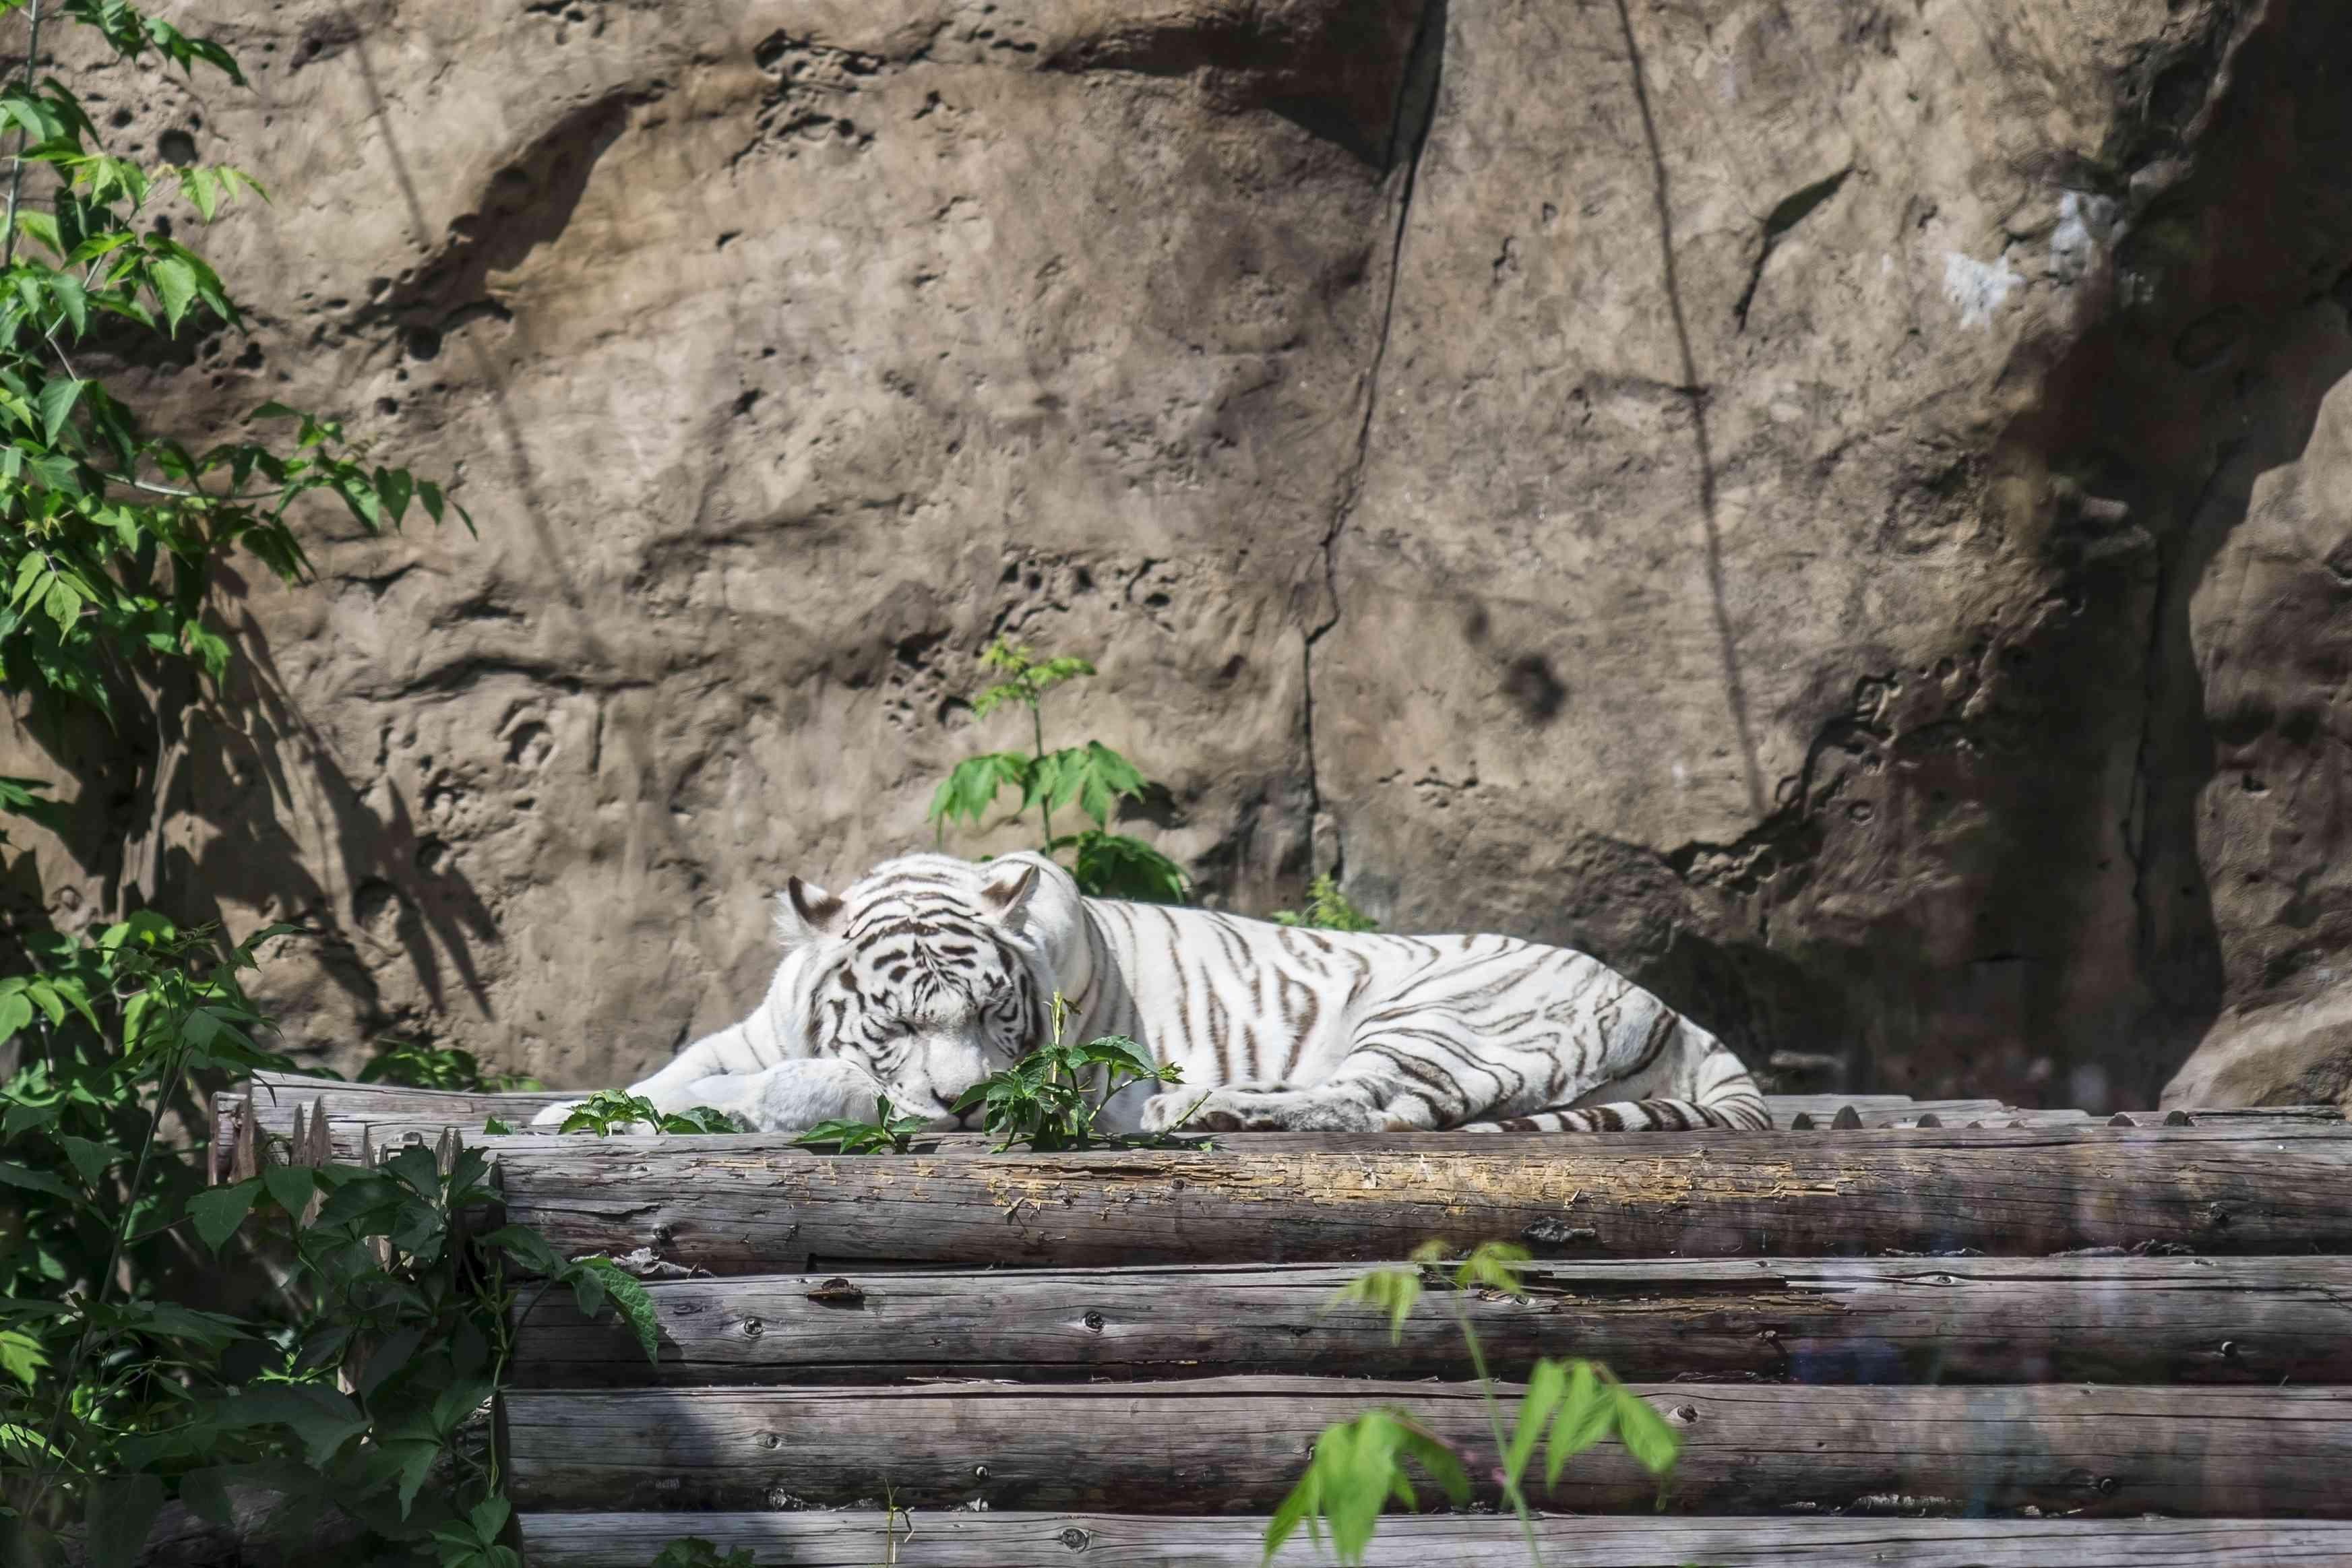 Sleeping white tiger at the Belgorod Zoo